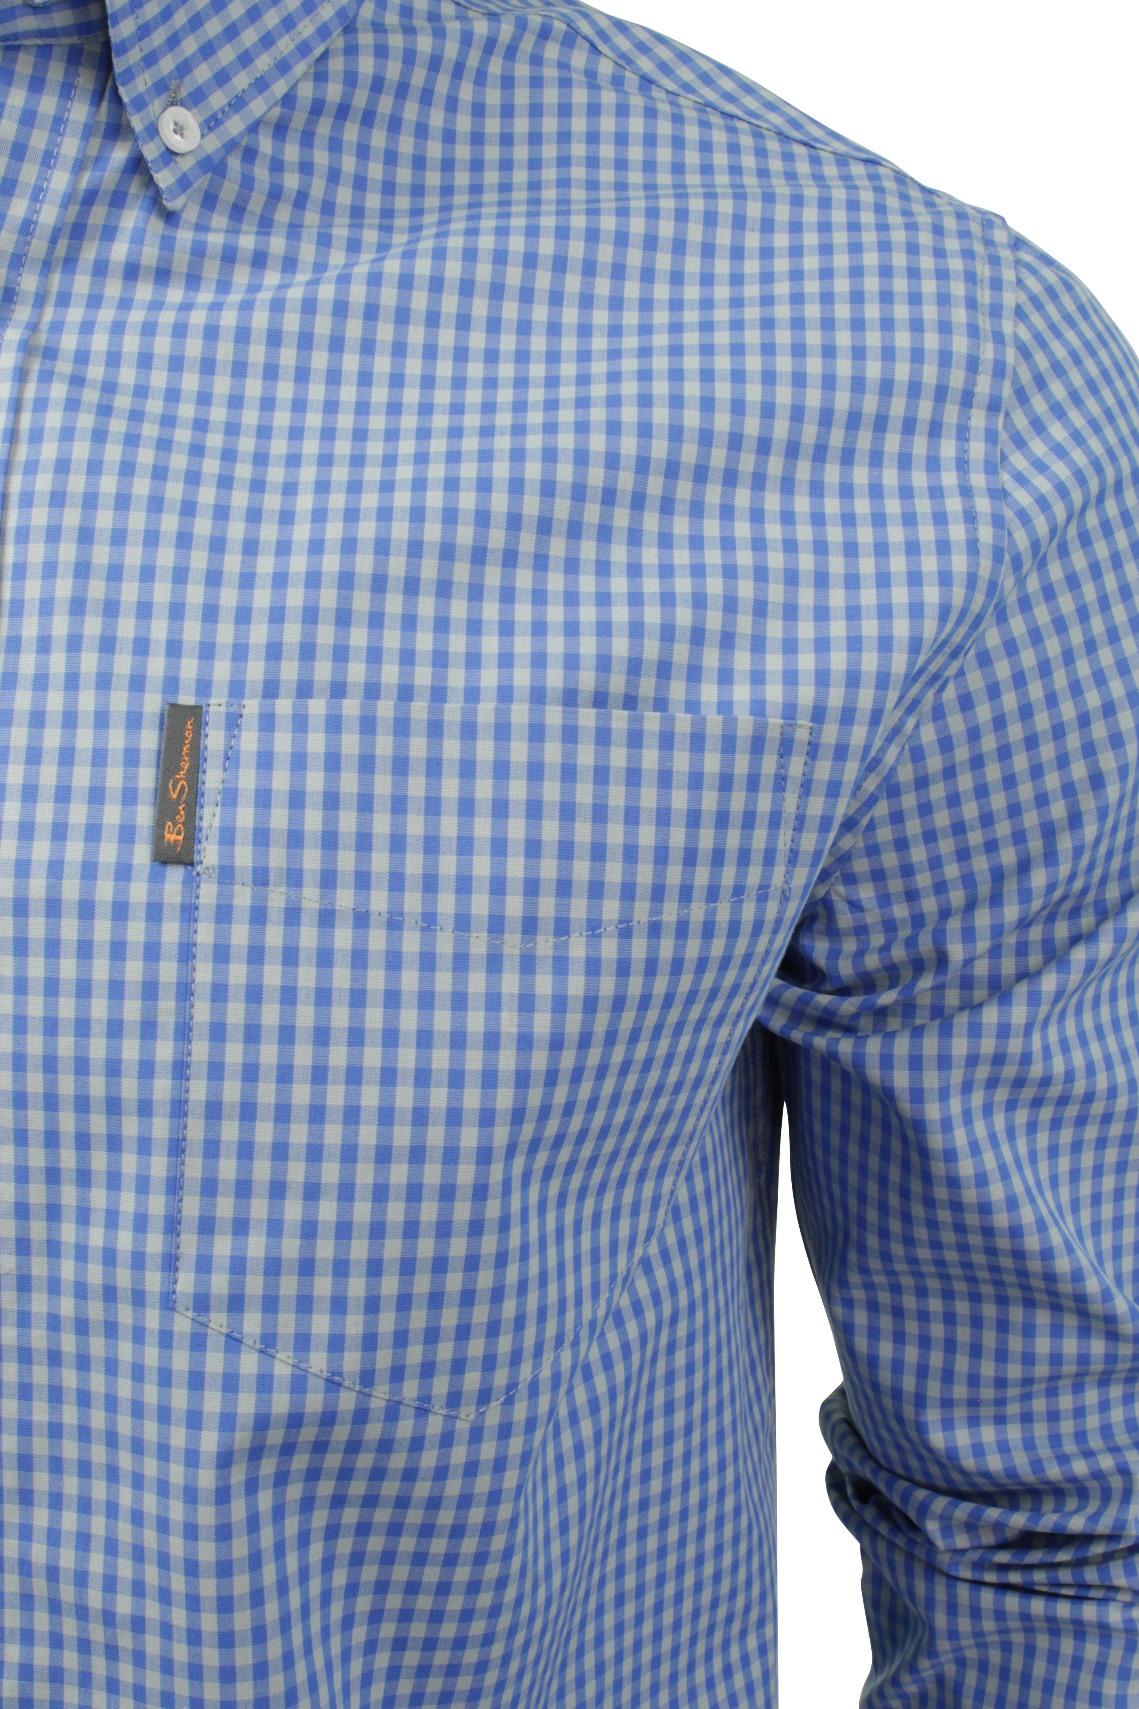 Mens Gingham Check Shirt by Ben Sherman Long Sleeved